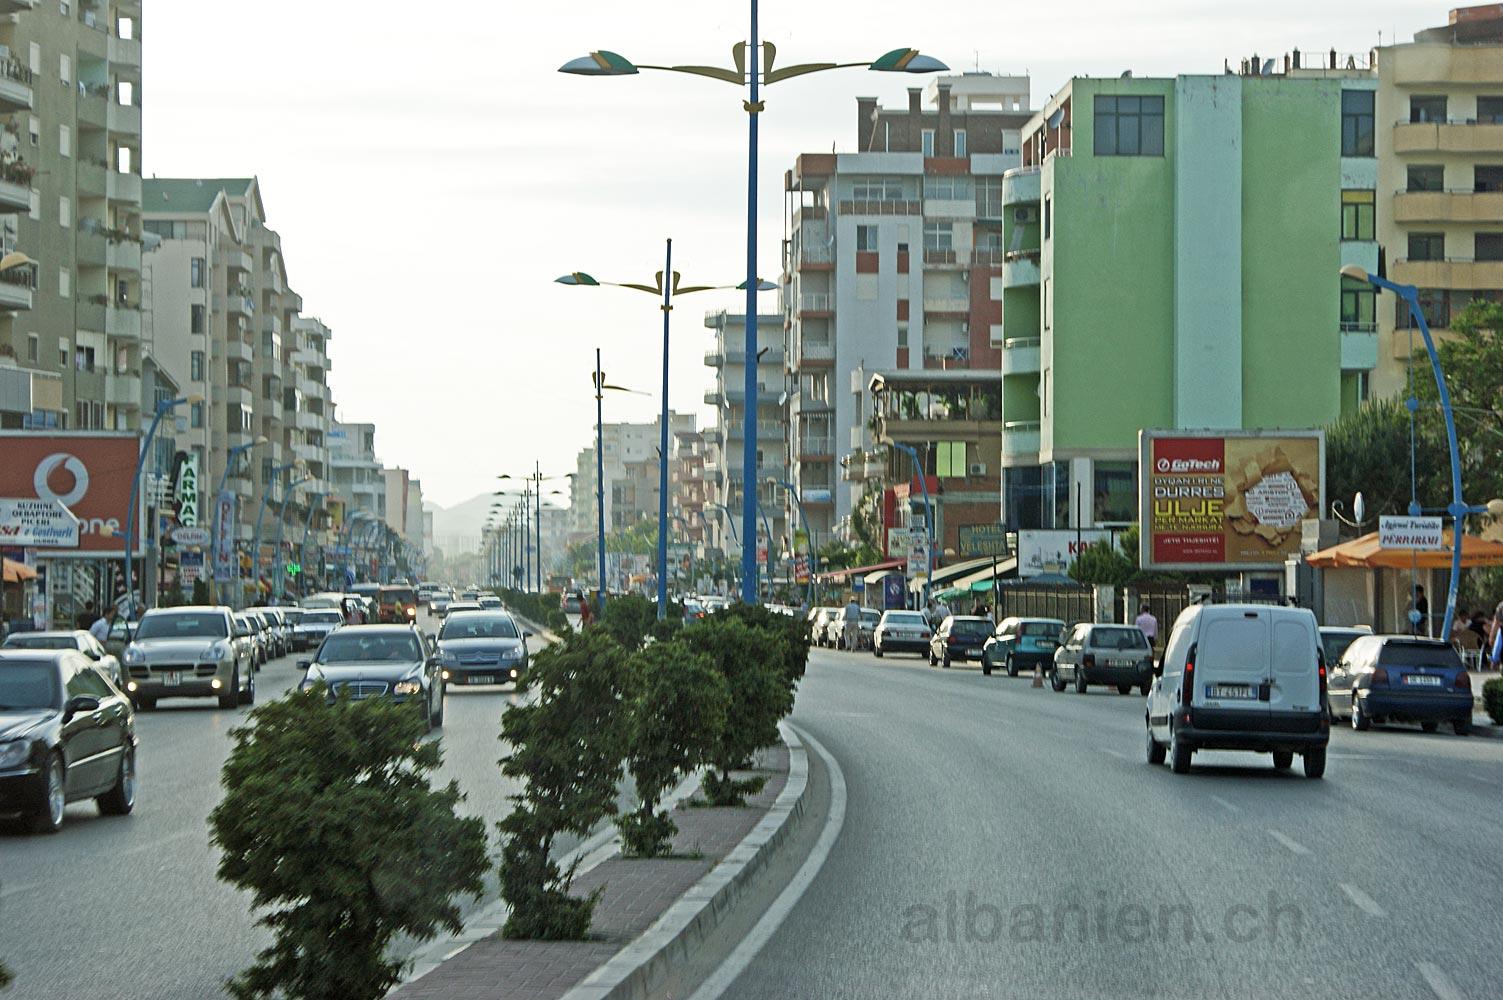 Durrës Plazh, Albanien